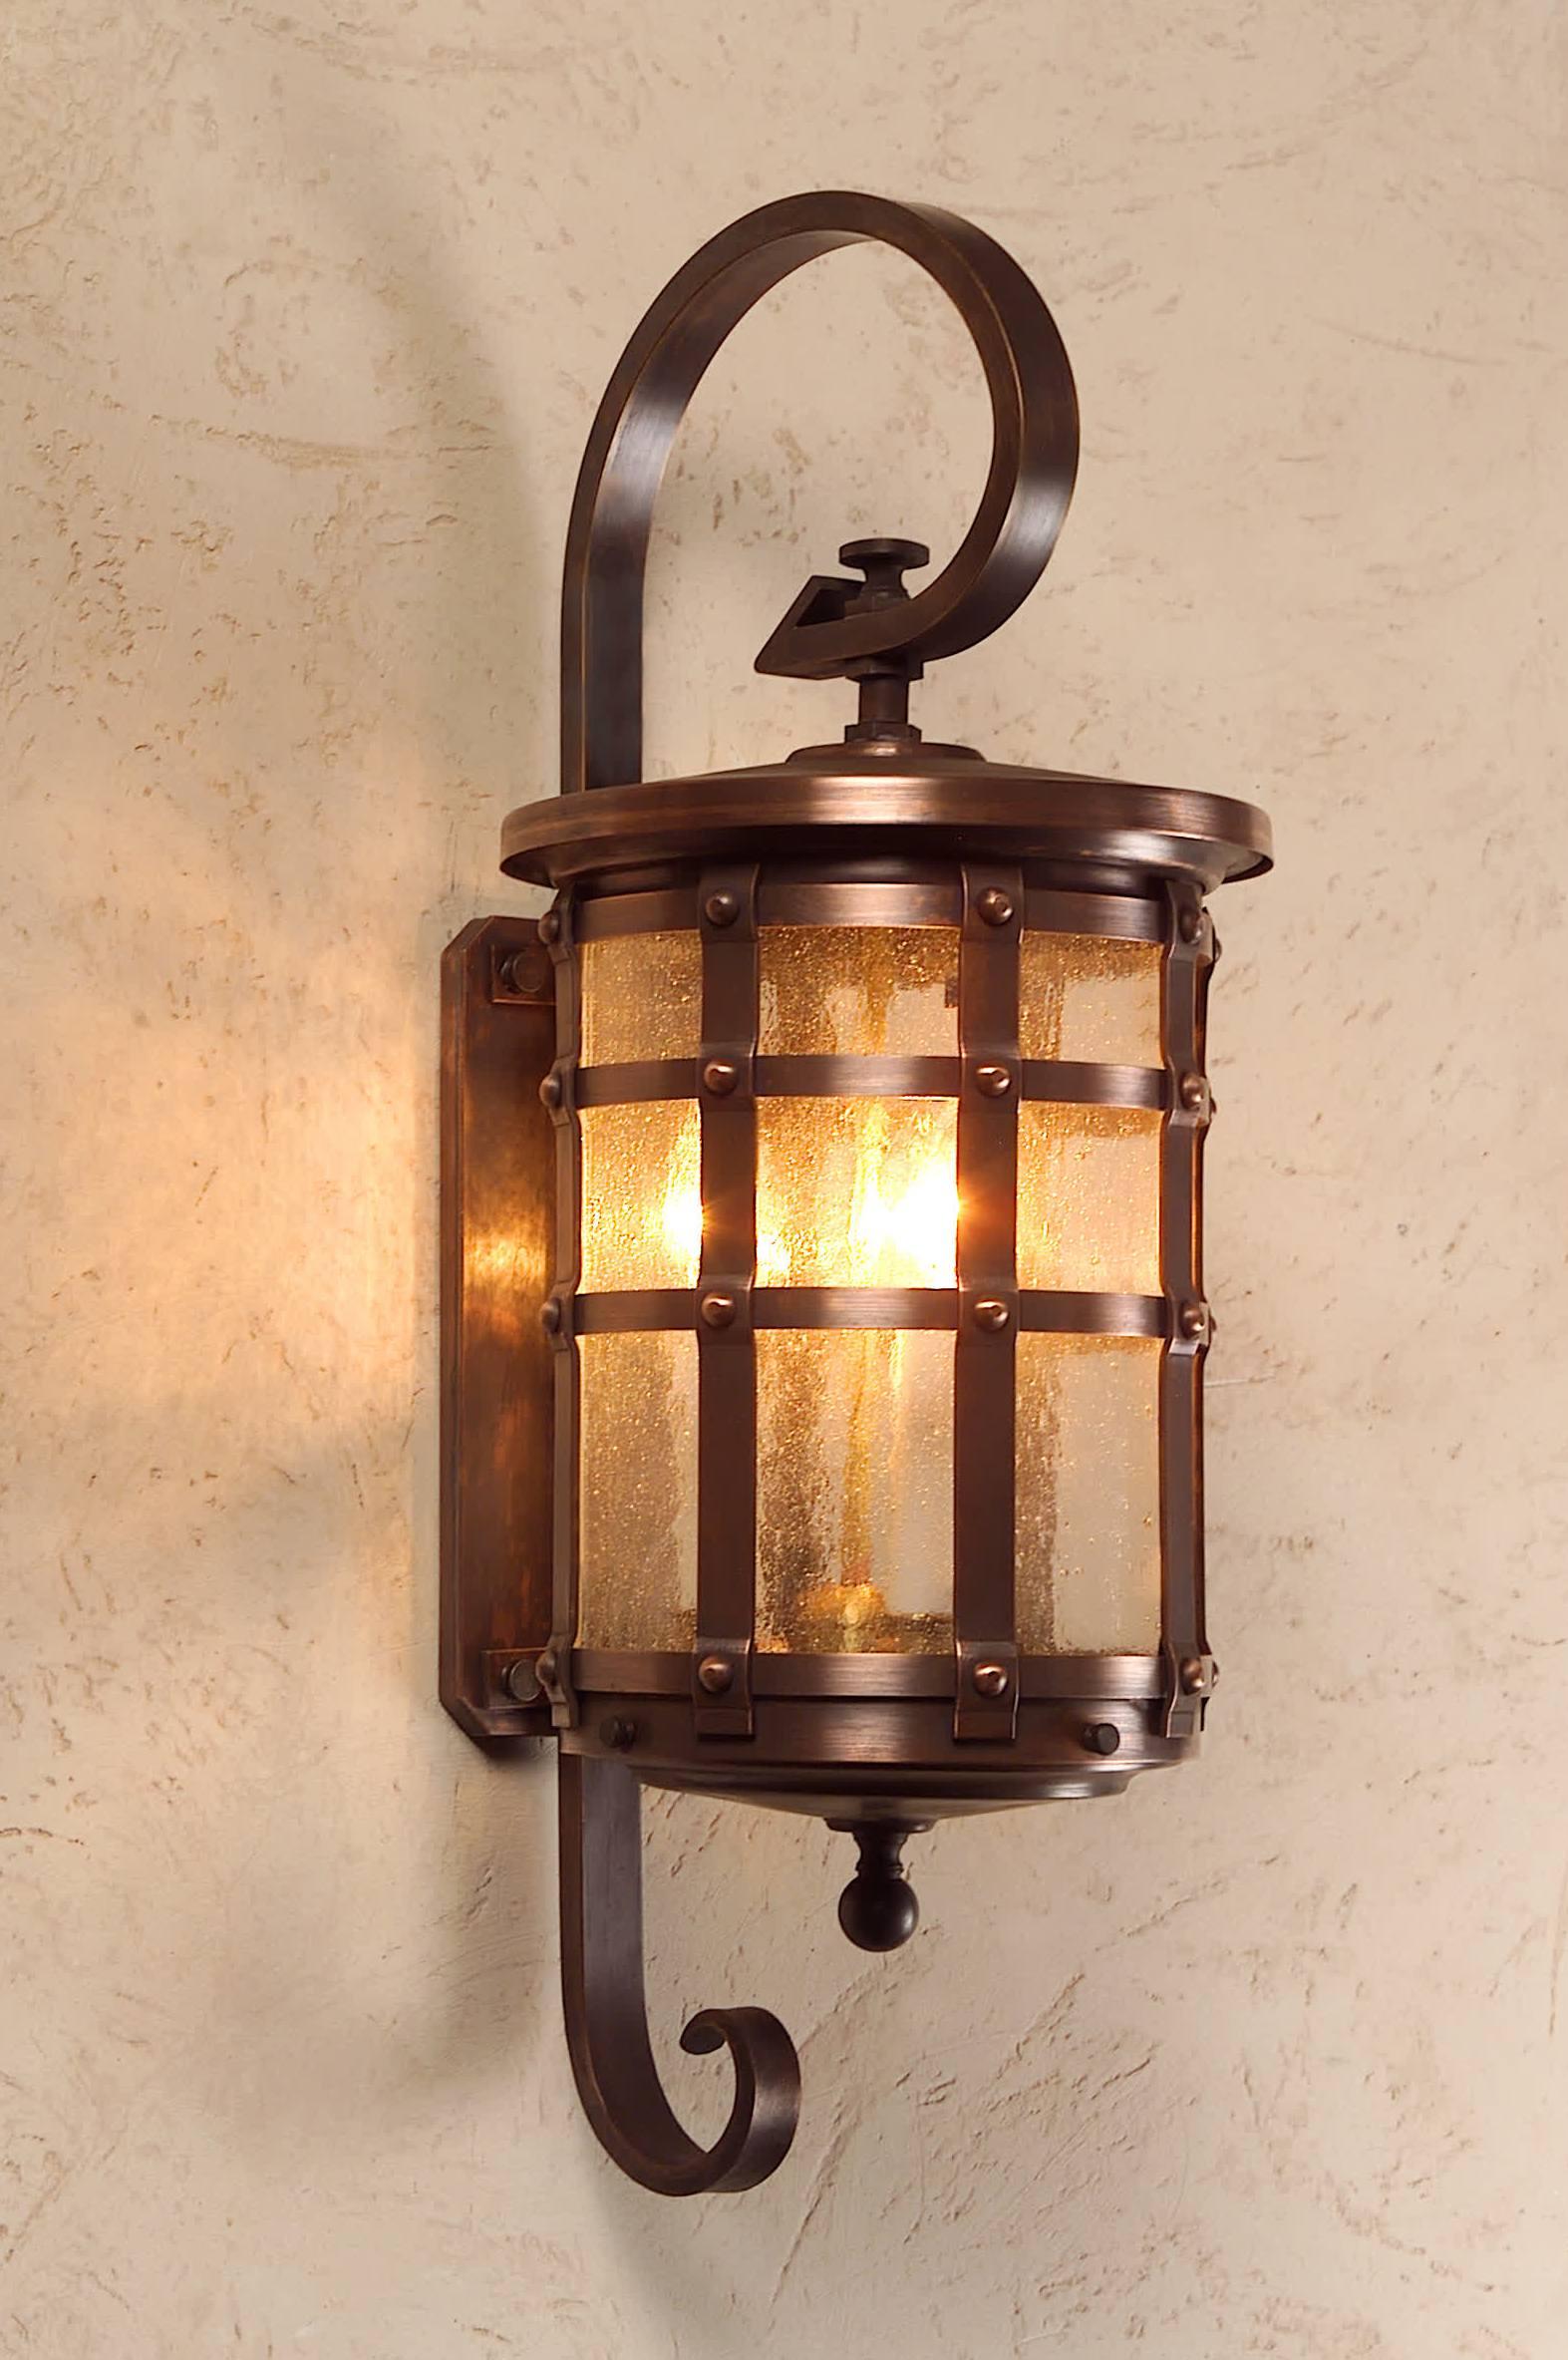 English Tudor Copper Wall lantern & Lanterns Revival Lighting